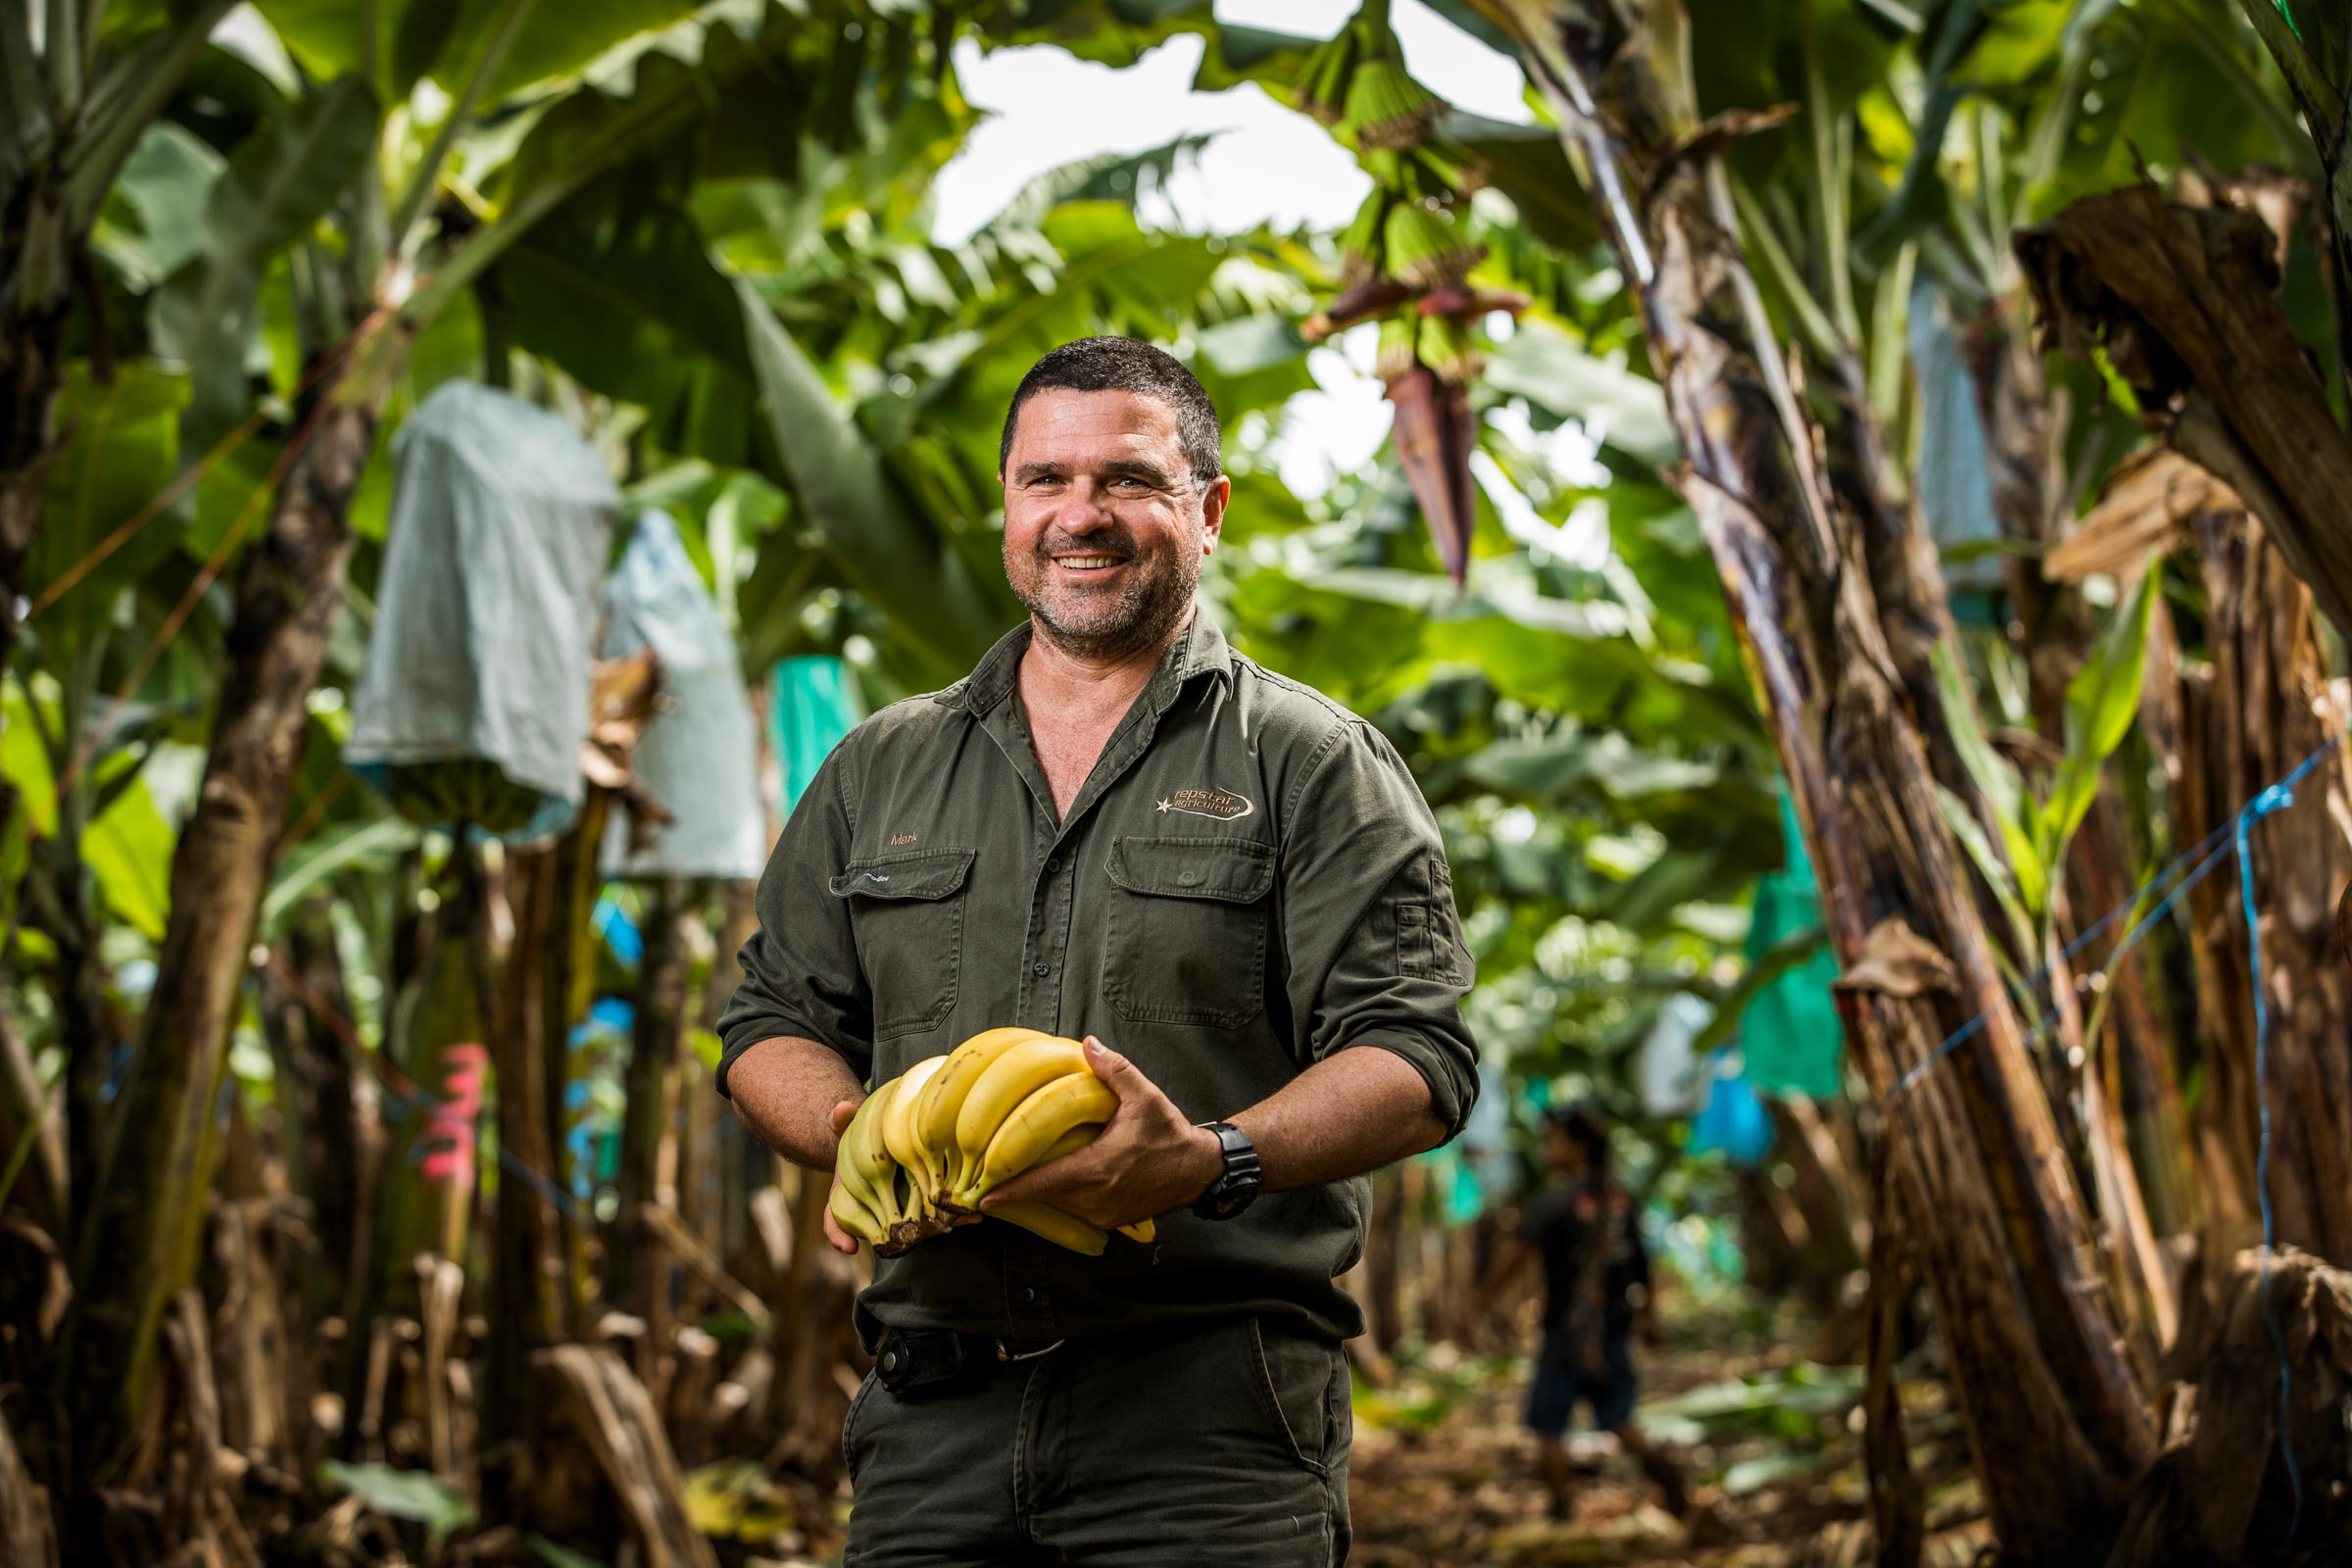 farmer holding a bunch of bananas in plantation